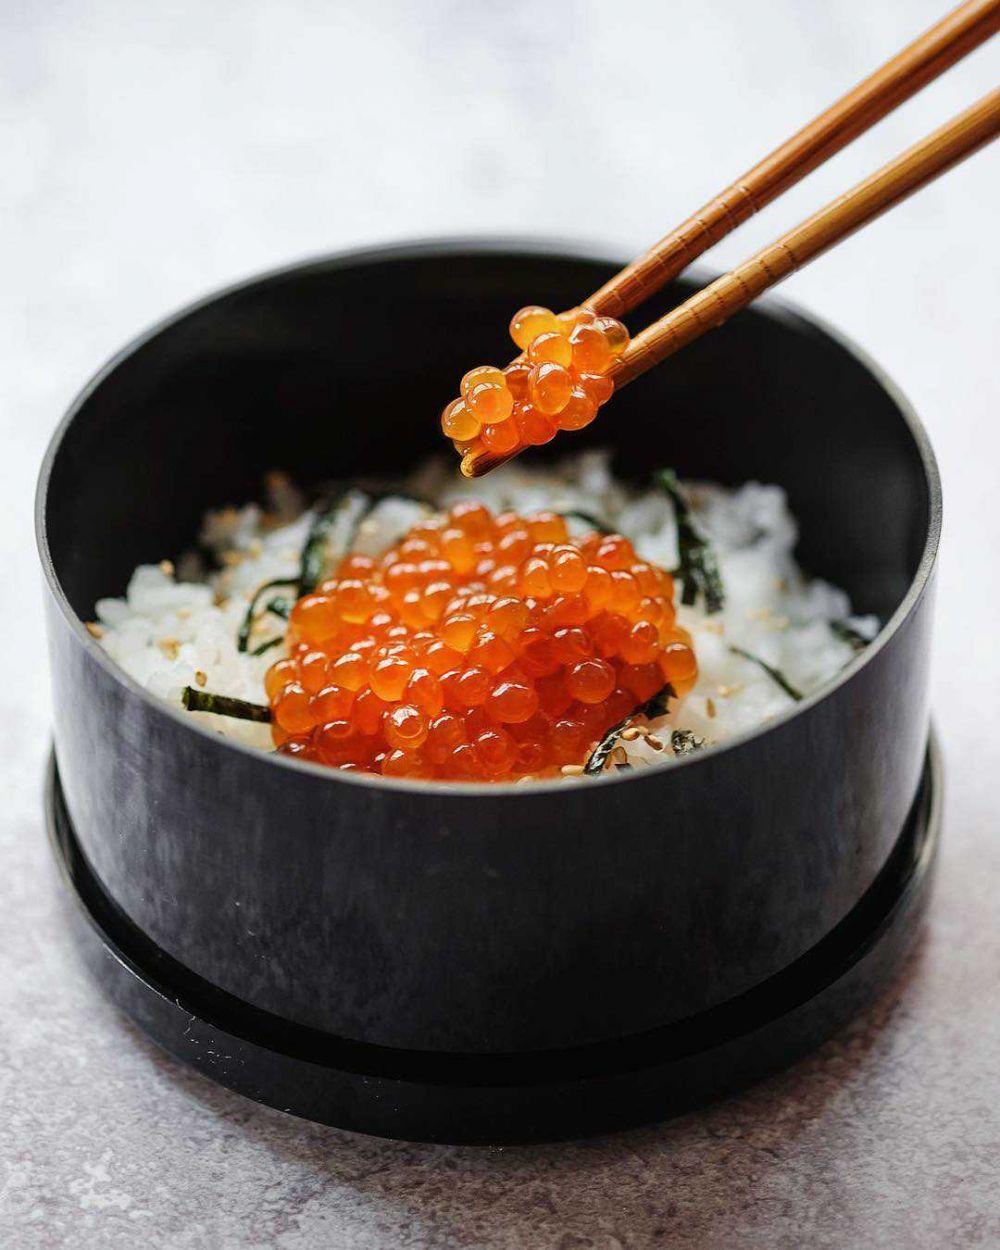 9 Variasi Menu Donburi Khas Jepang, Hidangan Nikmat Antiribet